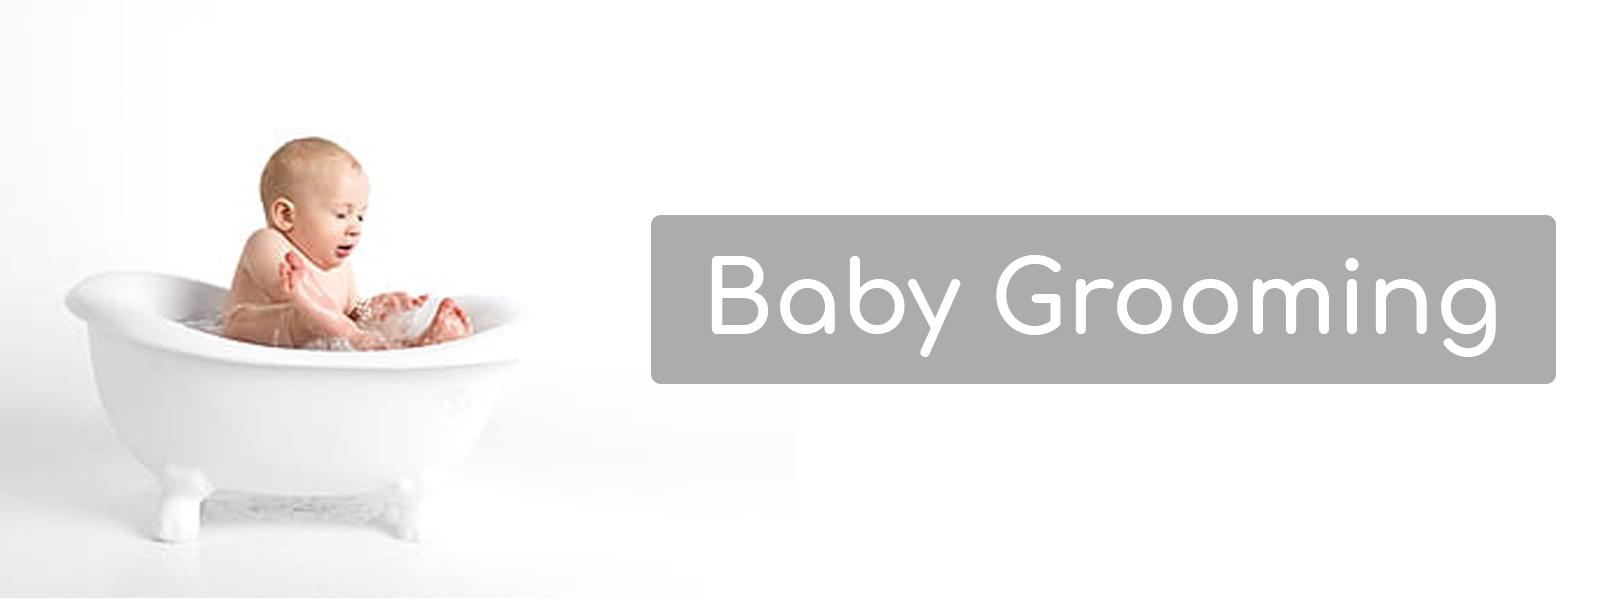 Flipkart Baby Grooming